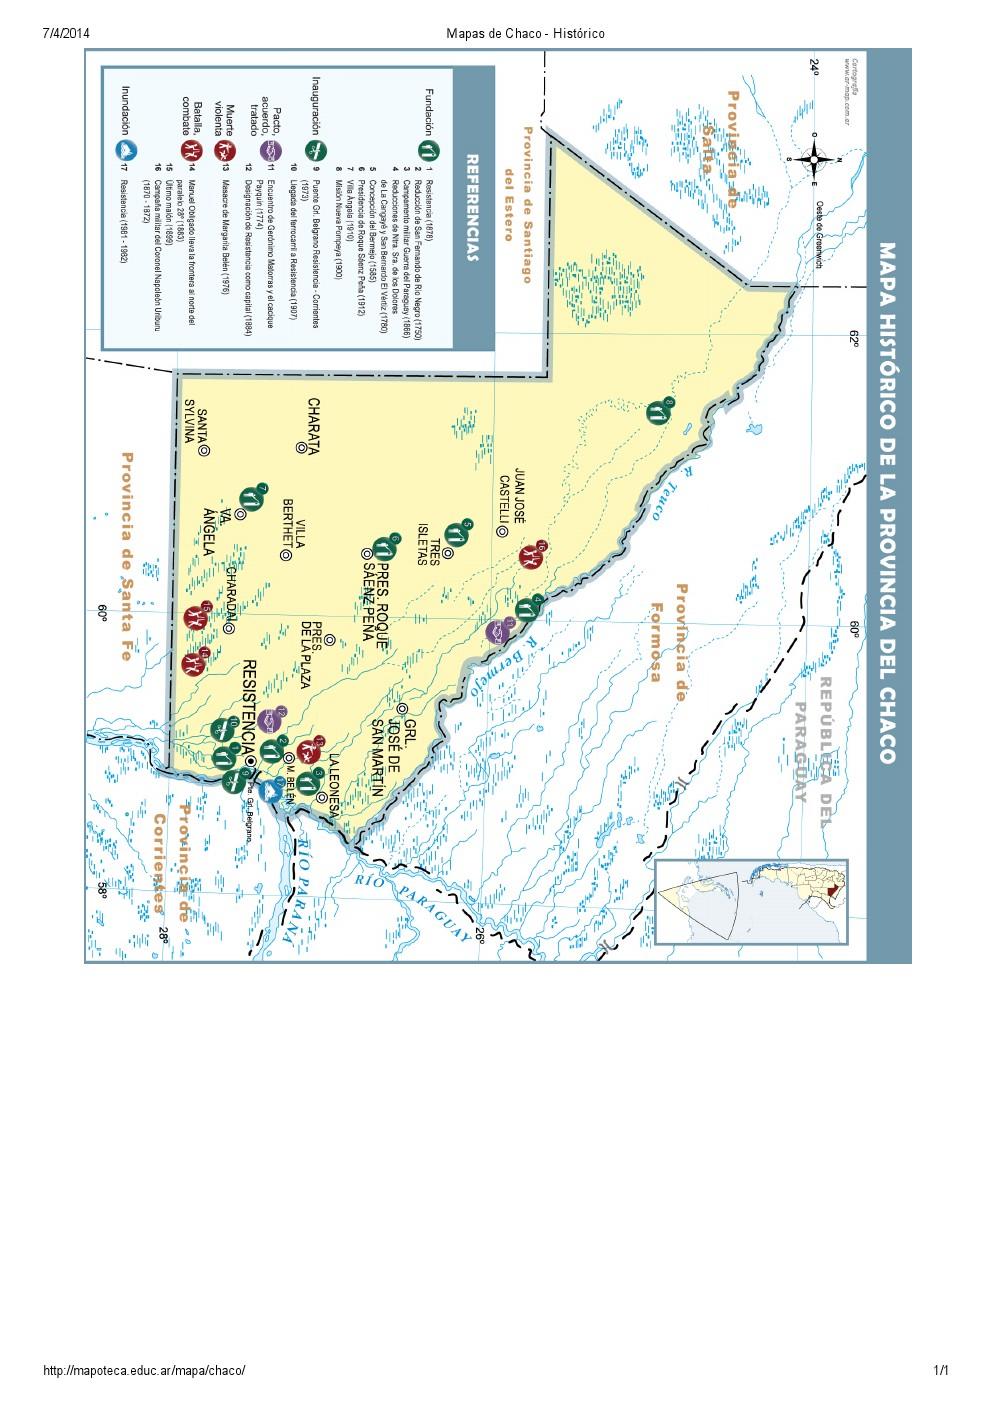 Mapa histórico del Chaco. Mapoteca de Educ.ar